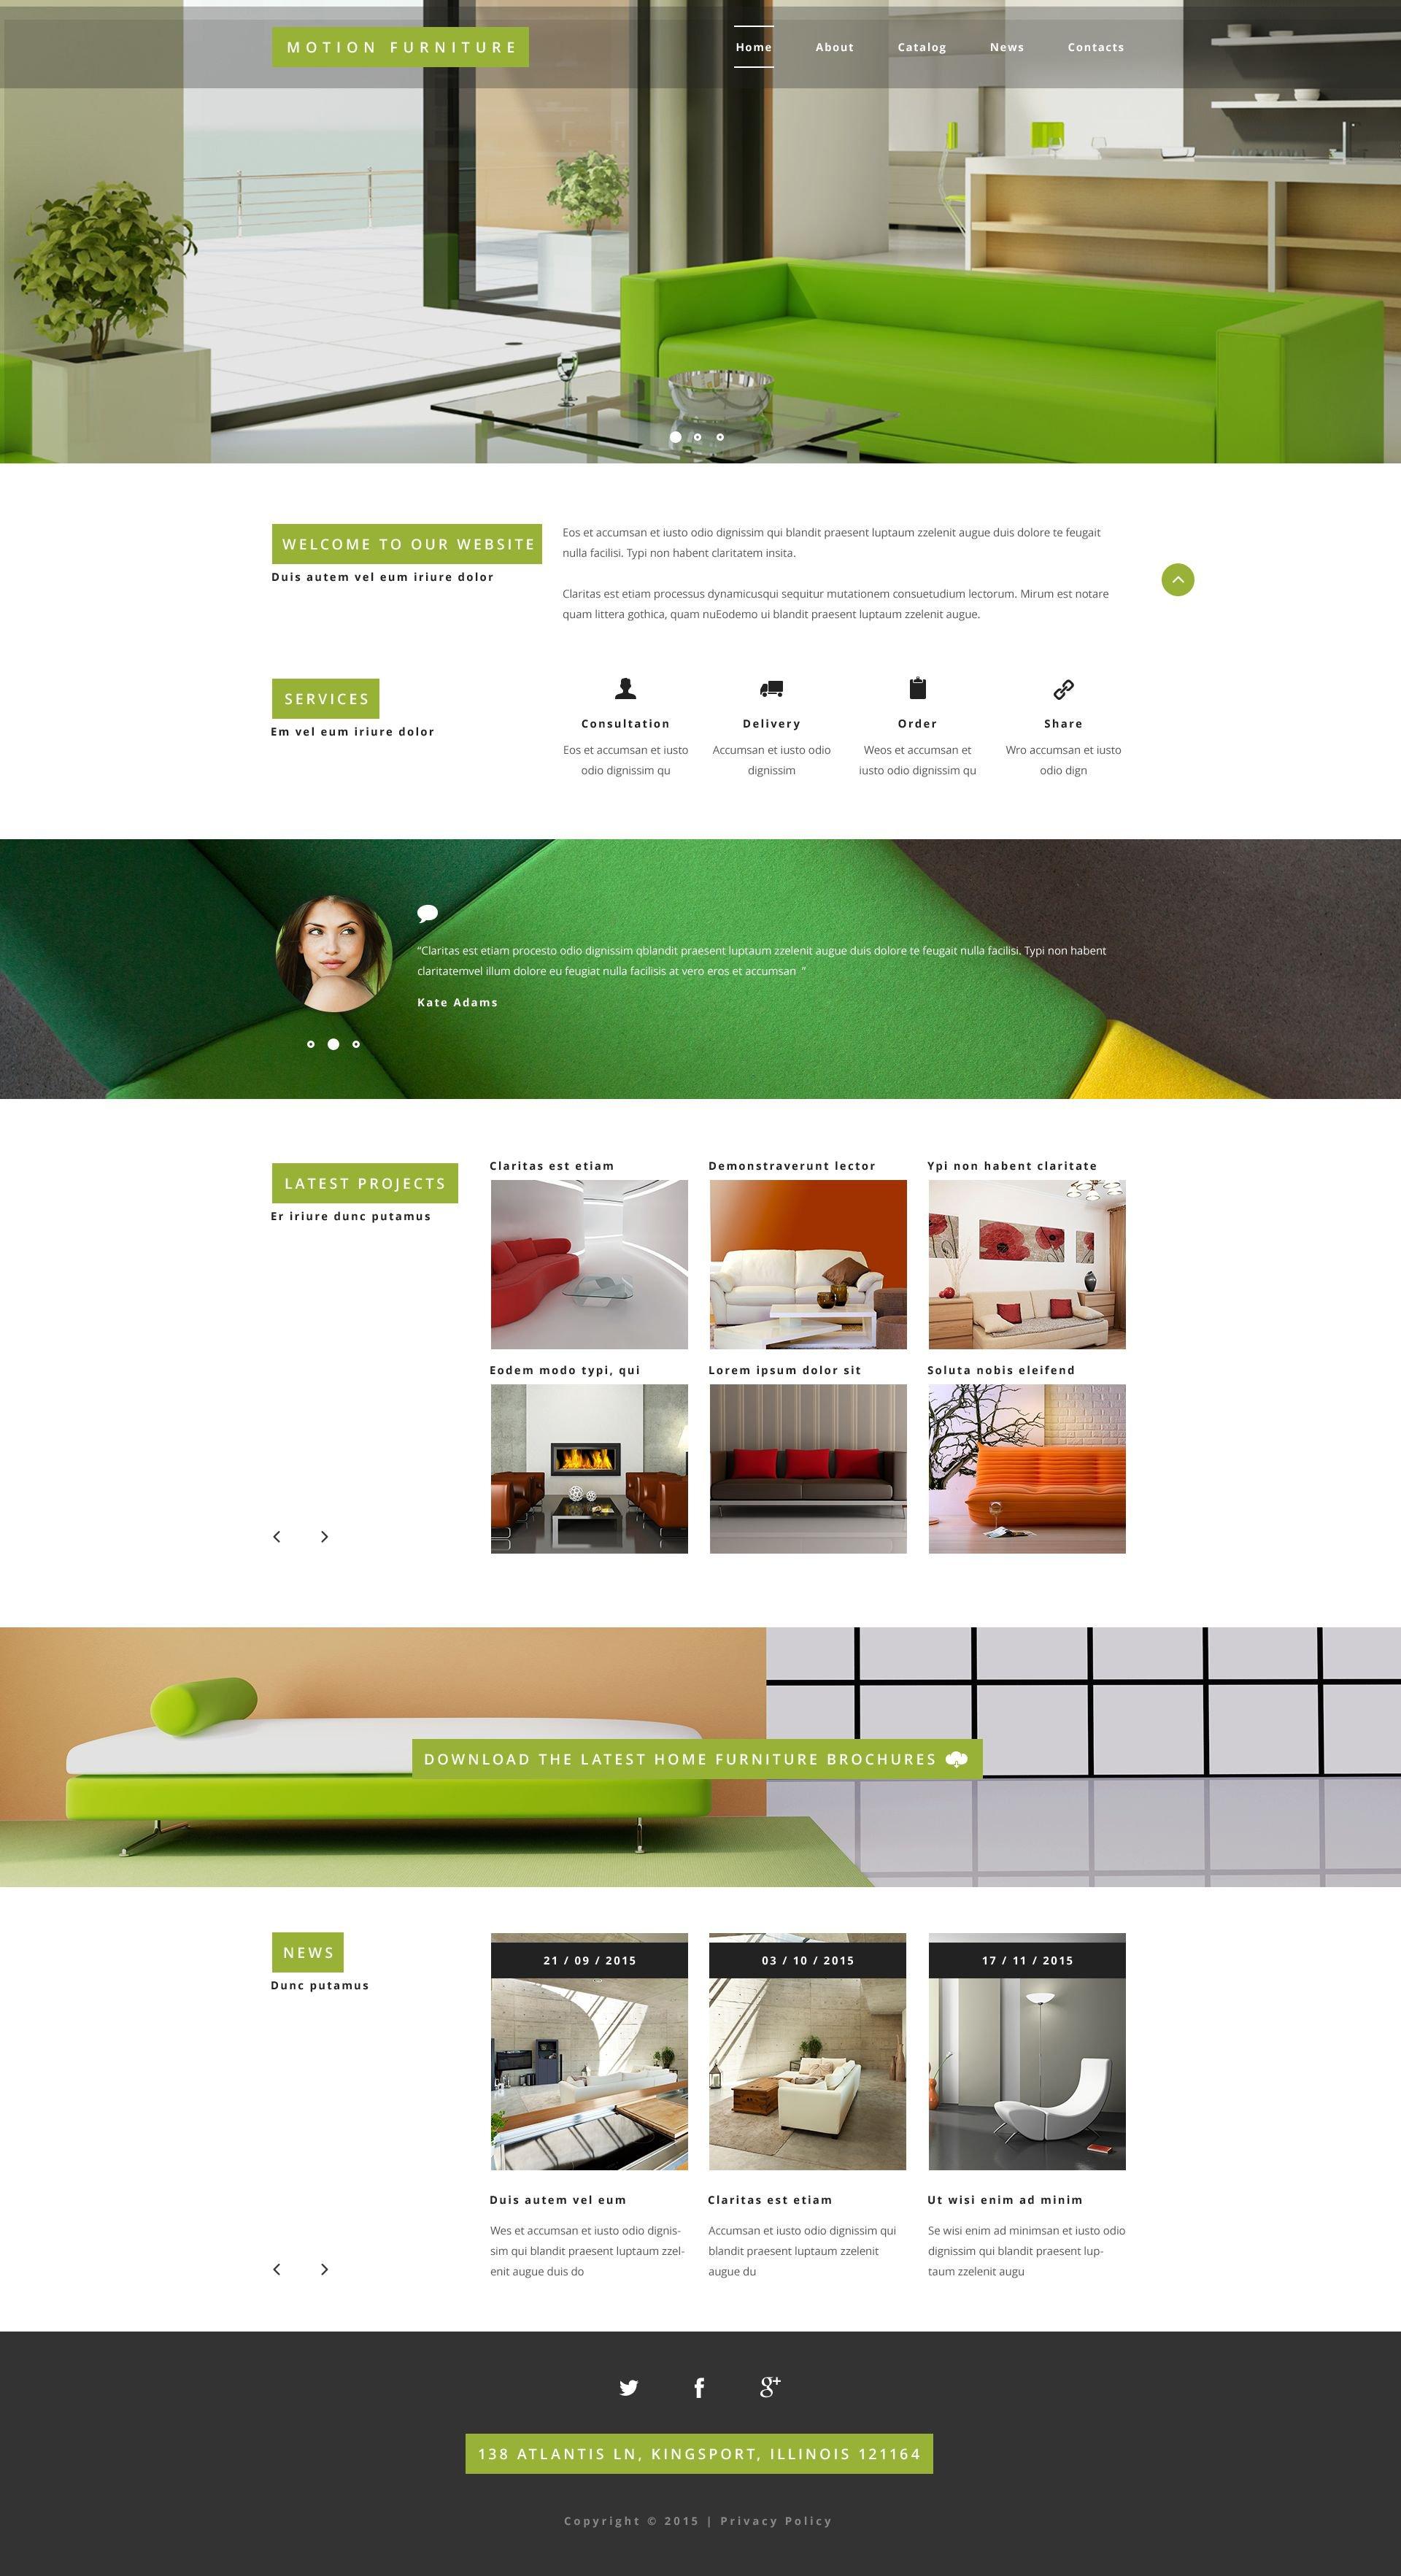 Reclining Furniture Template Web №54995 - screenshot